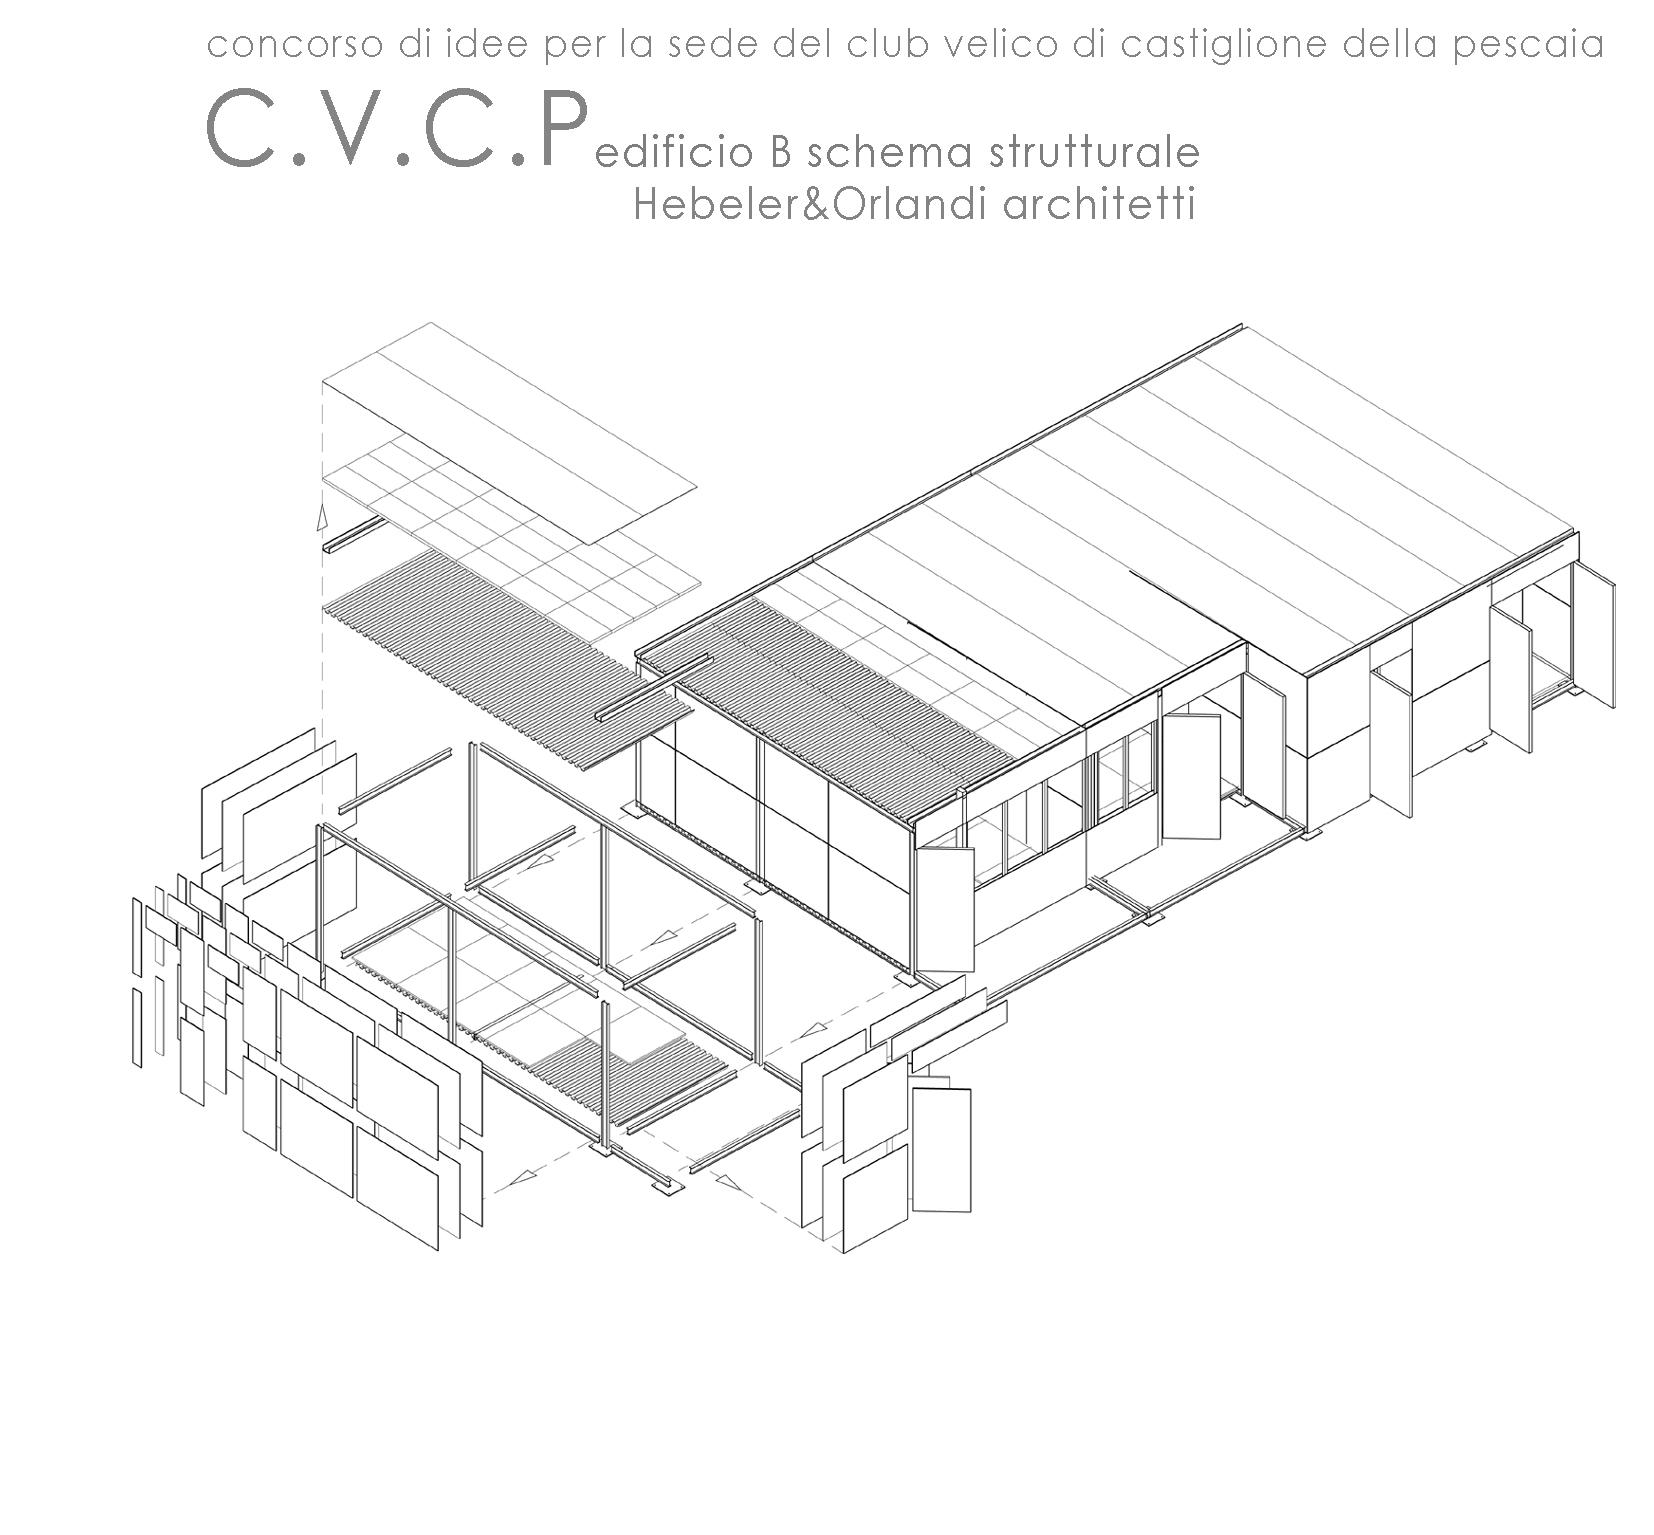 cvcp-esploso-